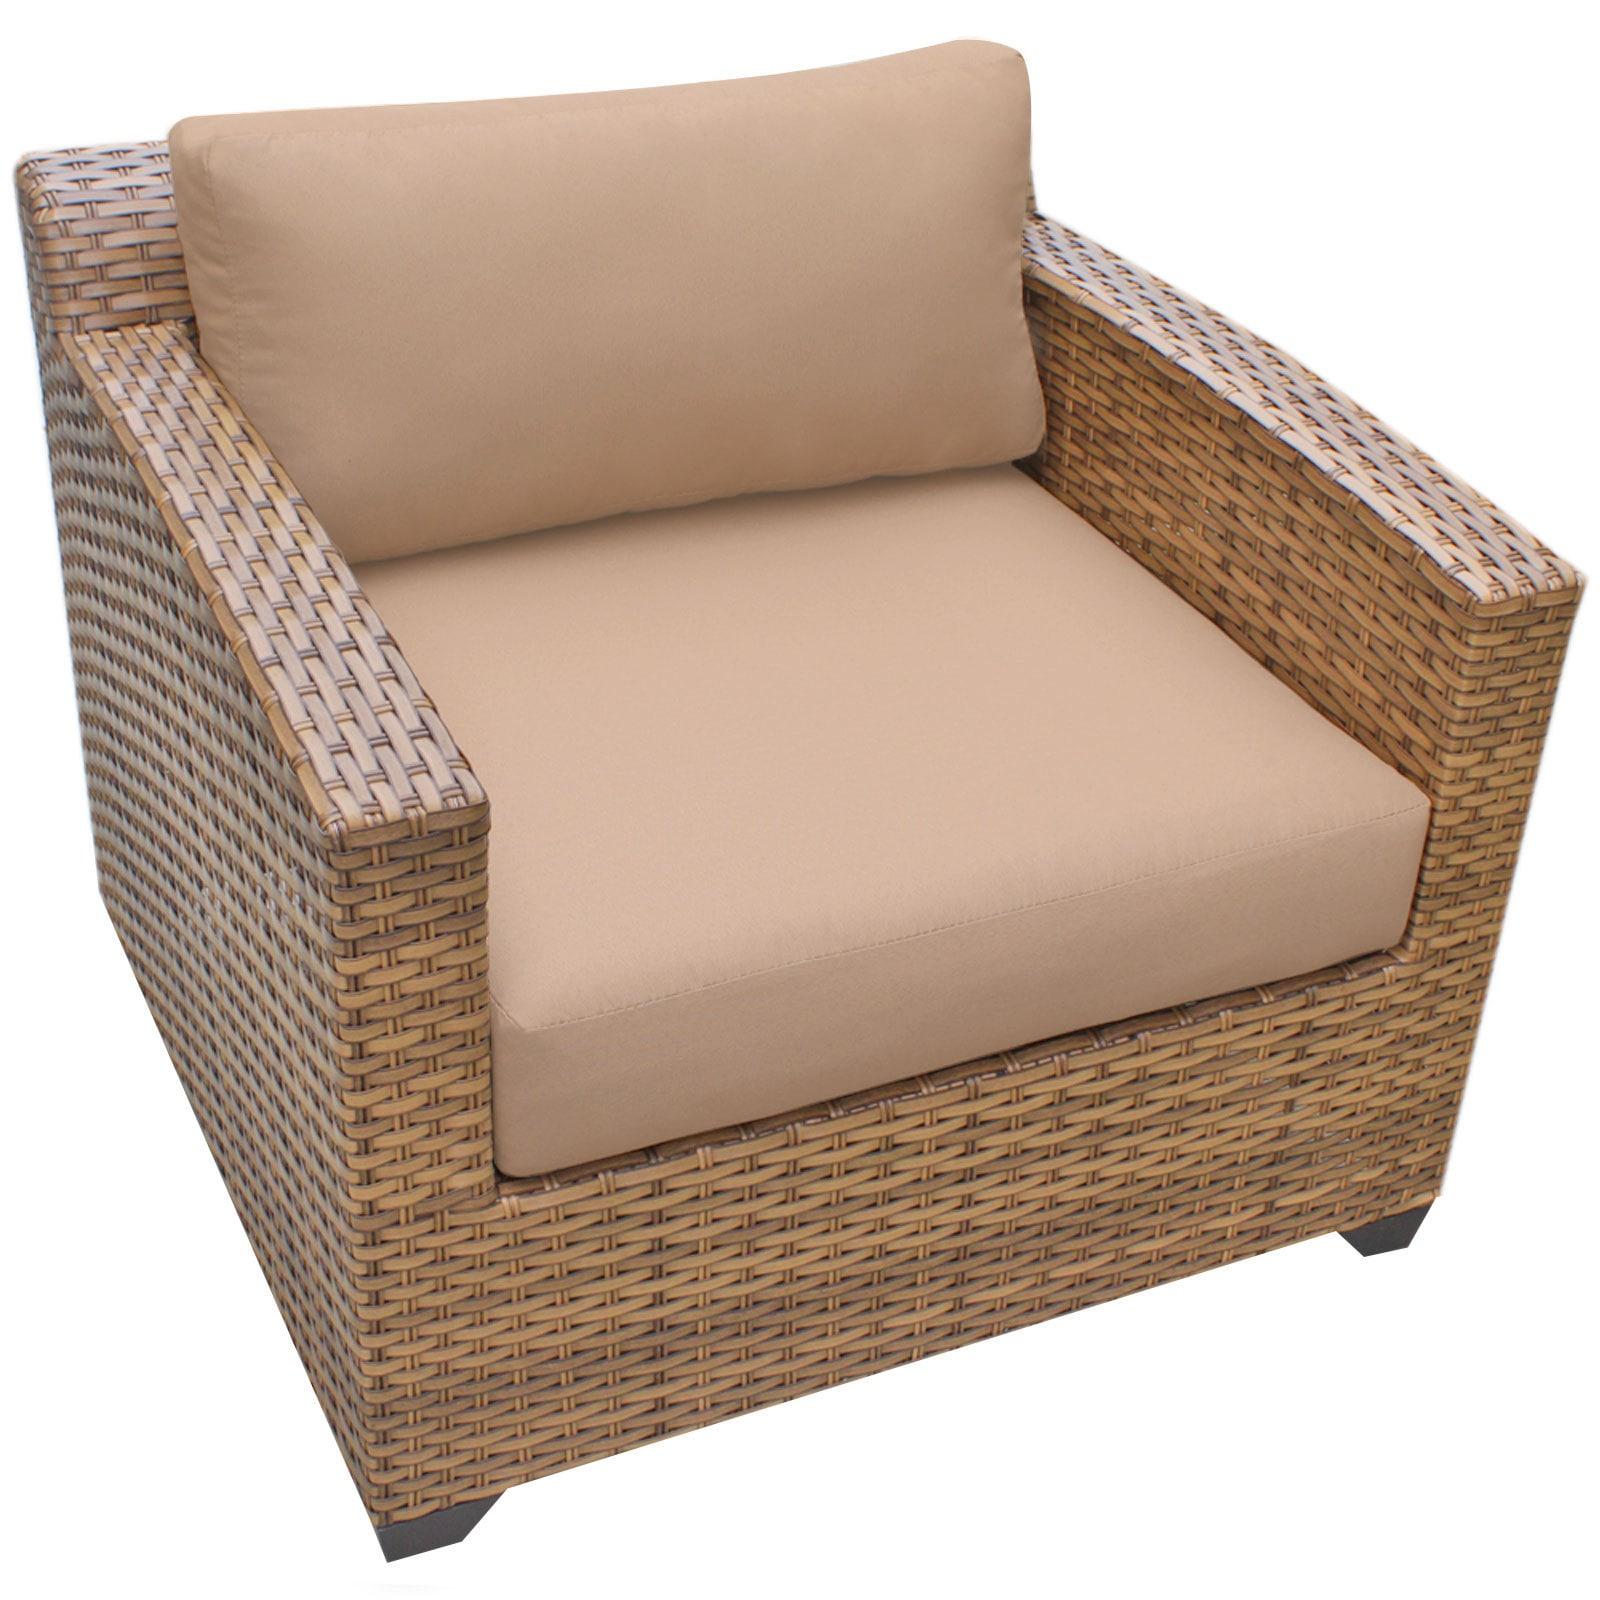 Laguna 11 Piece Outdoor Wicker Patio Furniture Set 11d Free